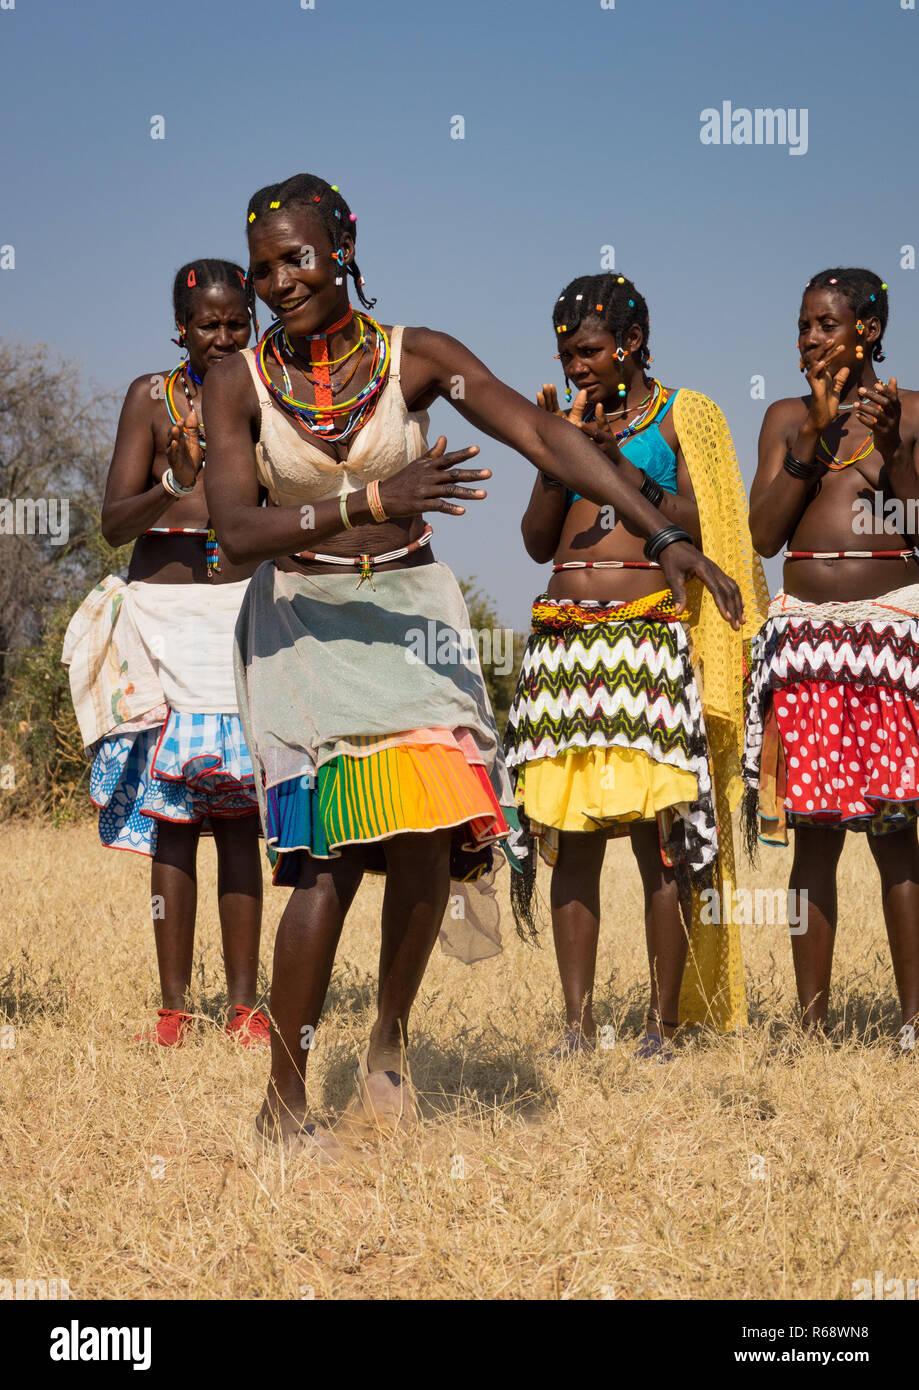 Mudimba tribe women dancing, Cunene Province, Cahama, Angola - Stock Image